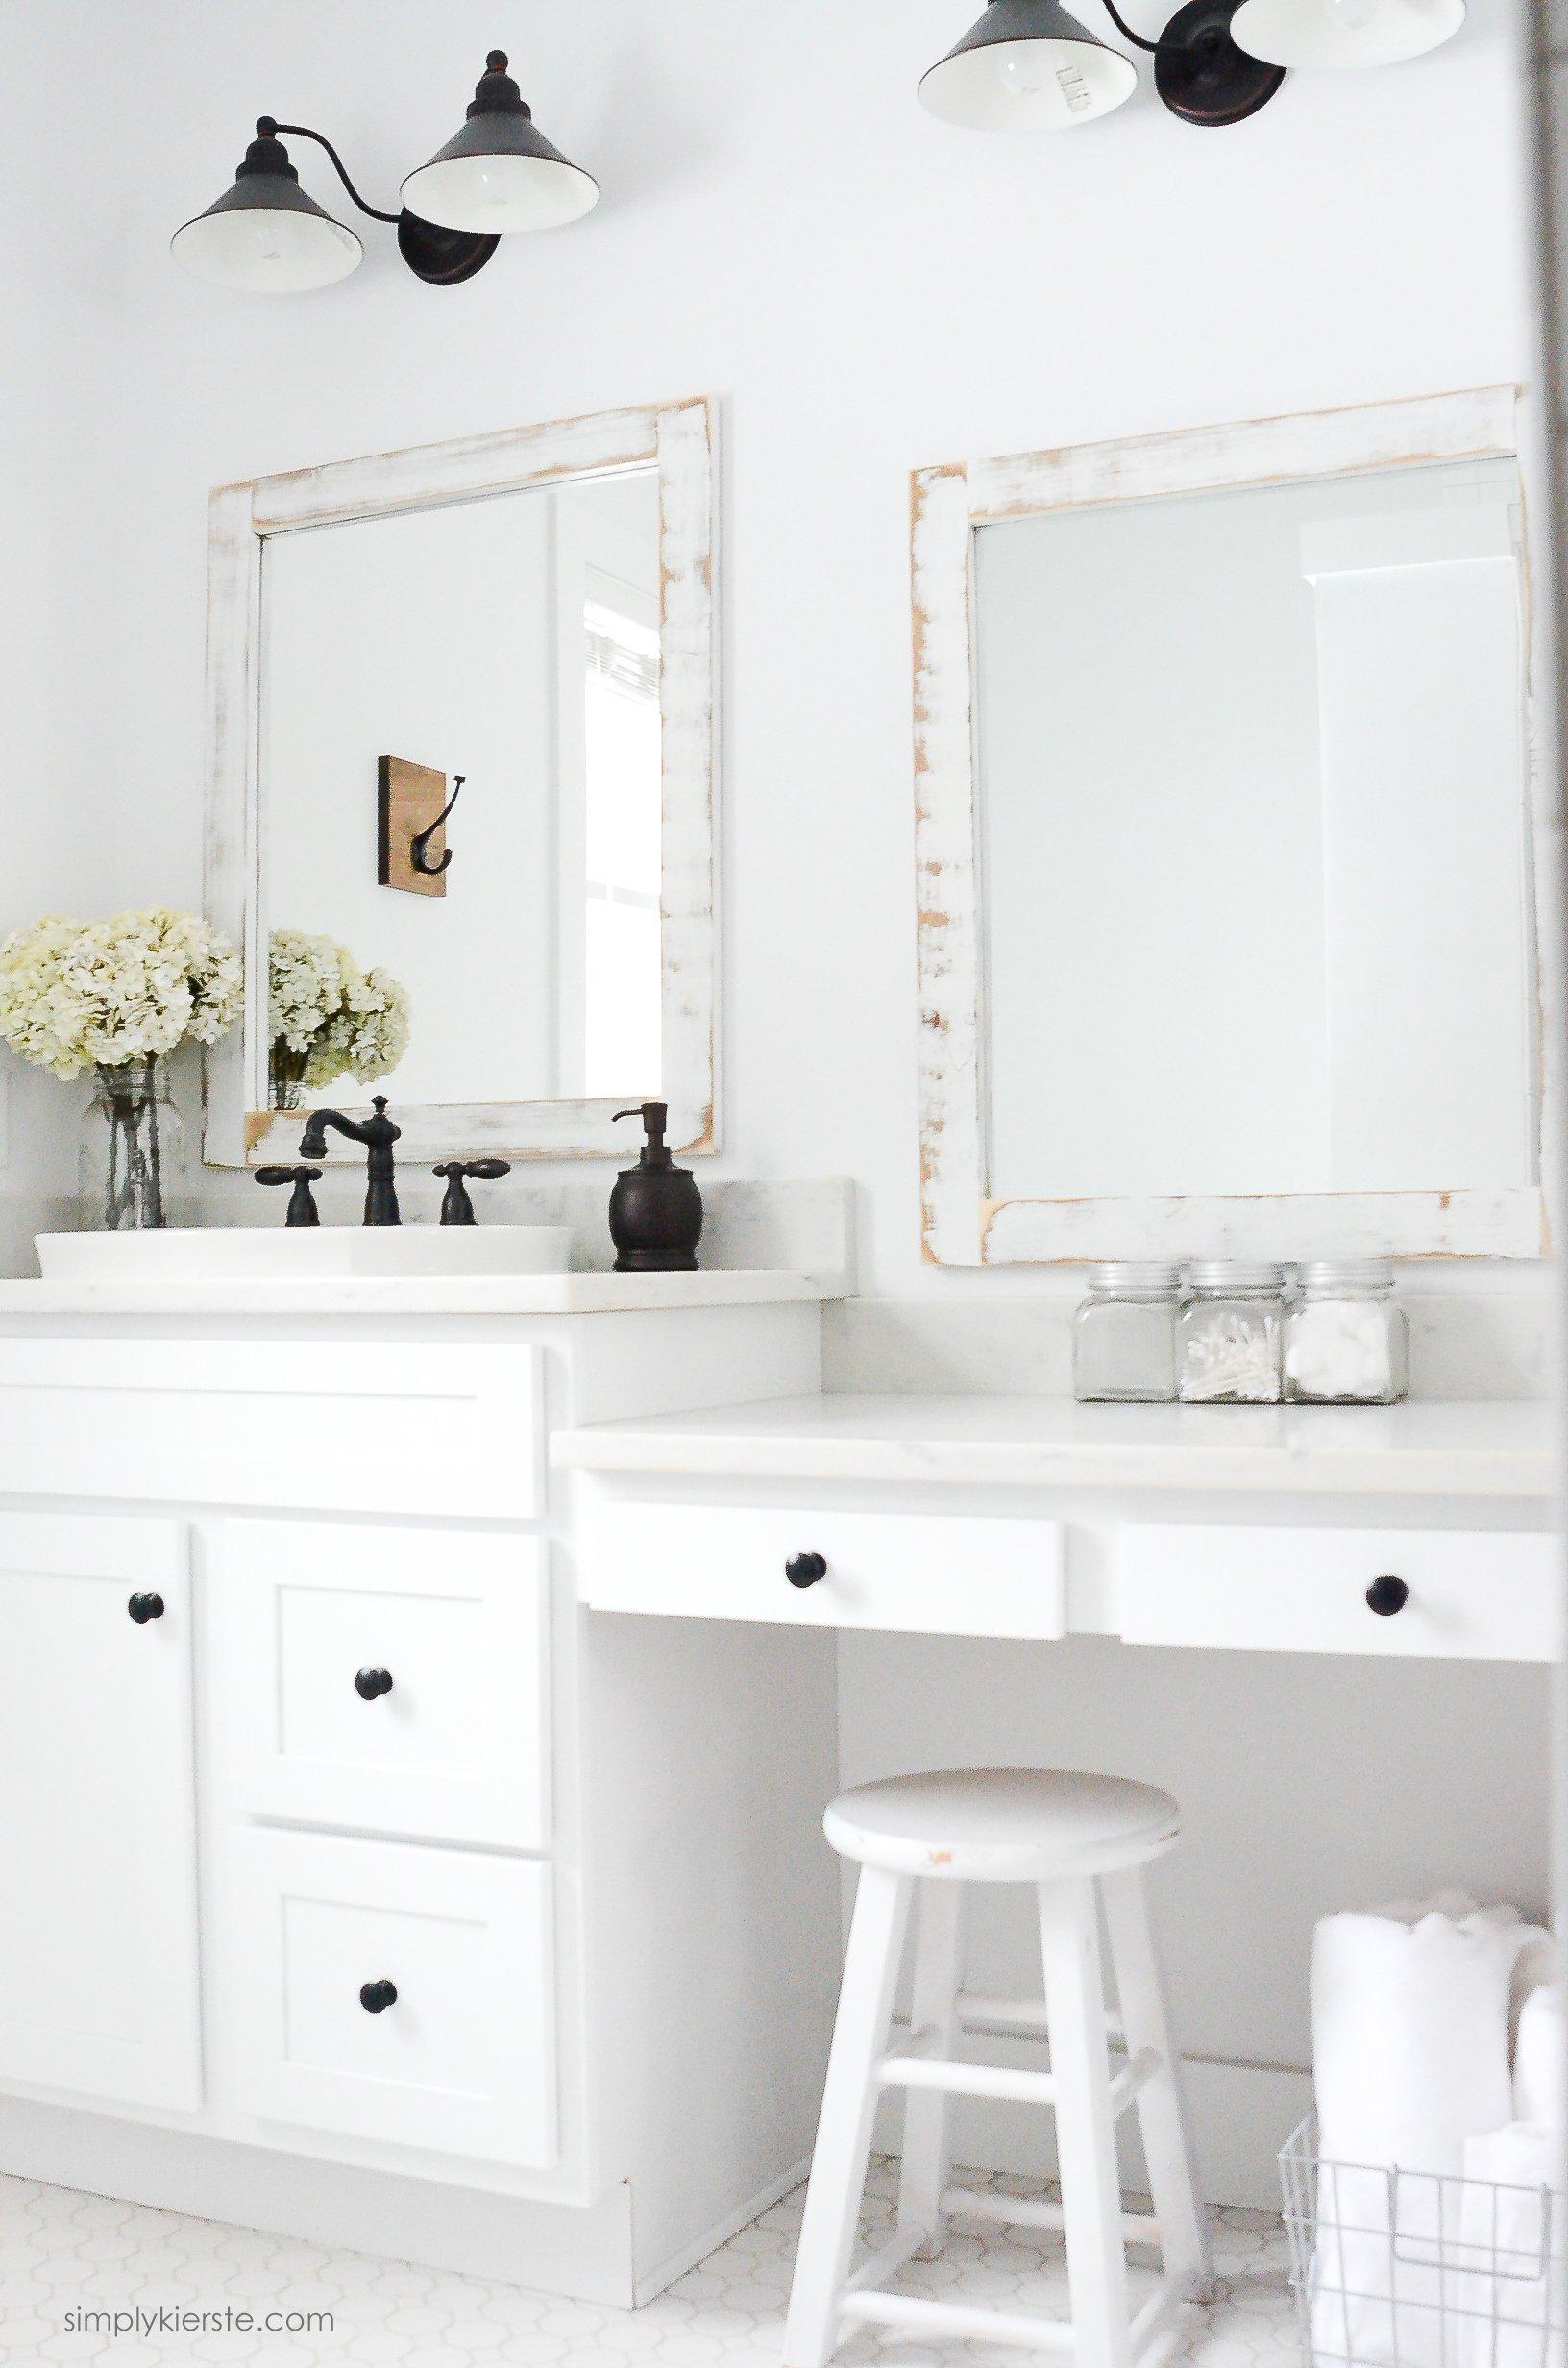 Farmhouse Bathroom | DIY Bathroom Mirrors | oldsaltfarm.com